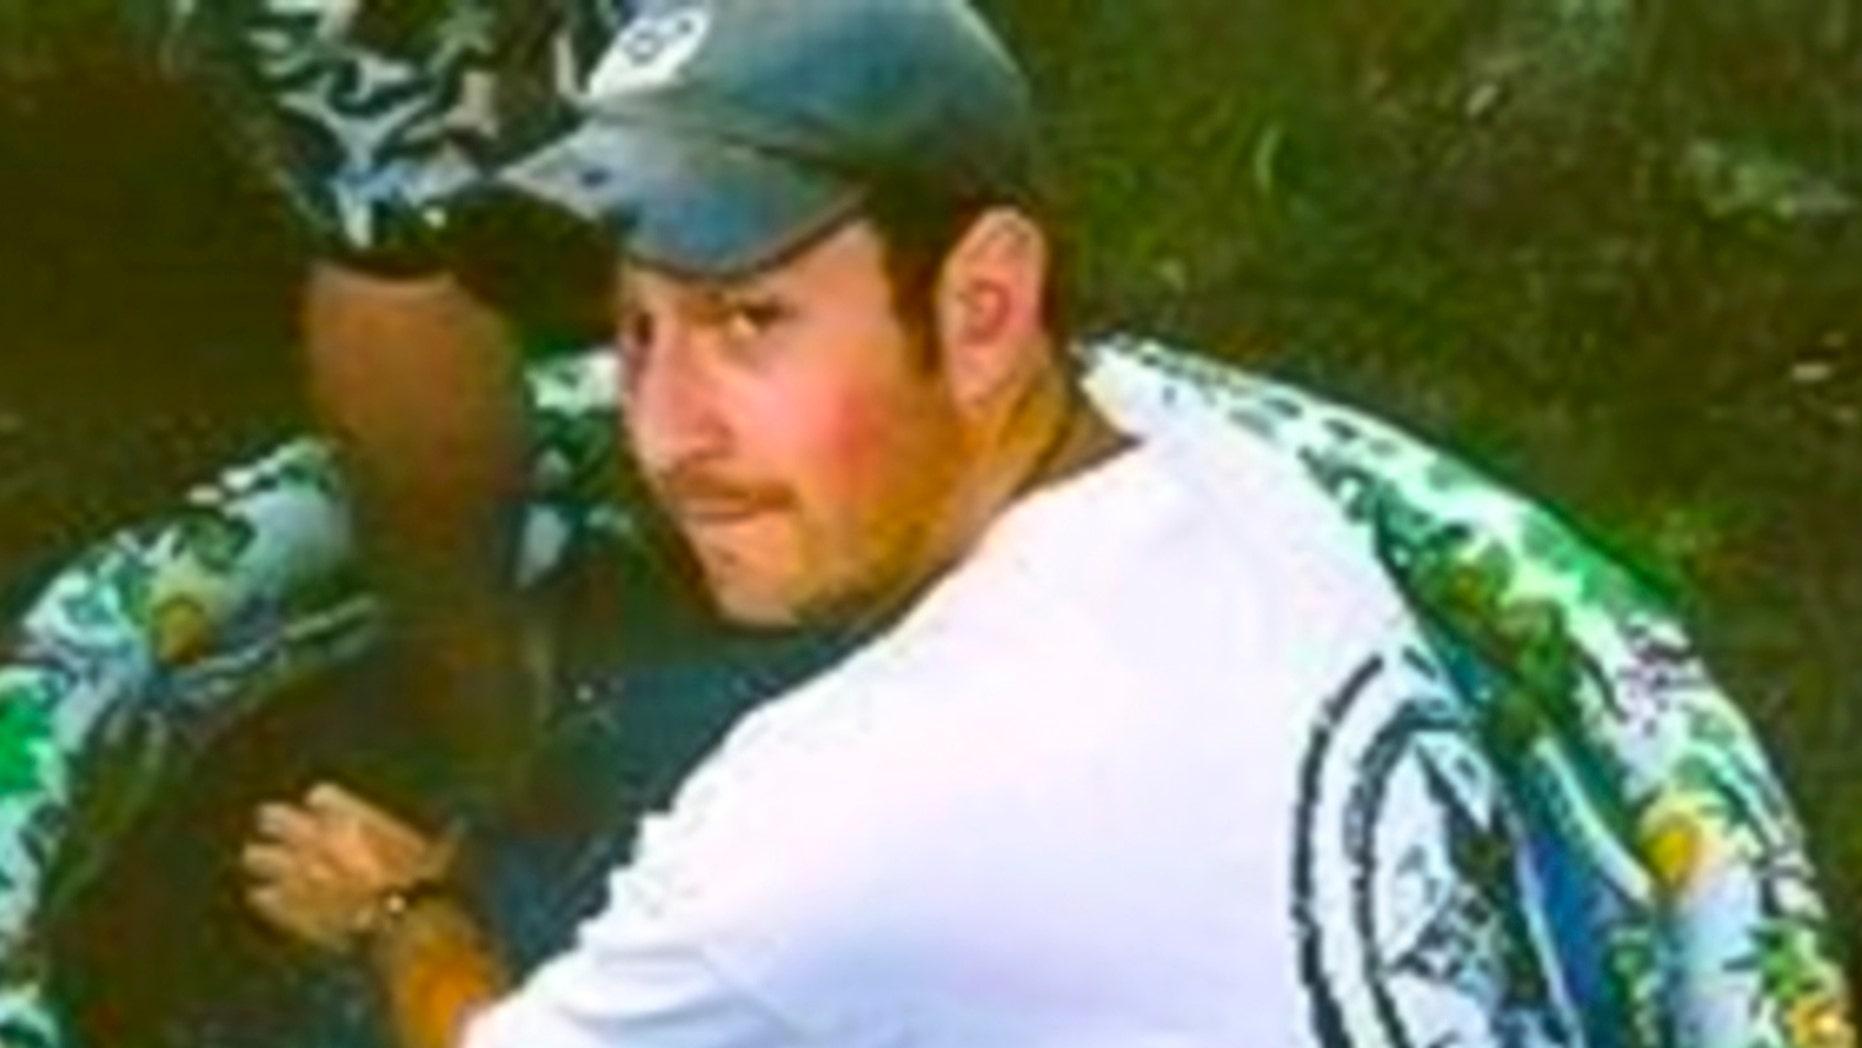 Hero teacher Scott Beigel, 35, gave fiancée Gwen instructions for his funeral should he ever die in a school shooting.